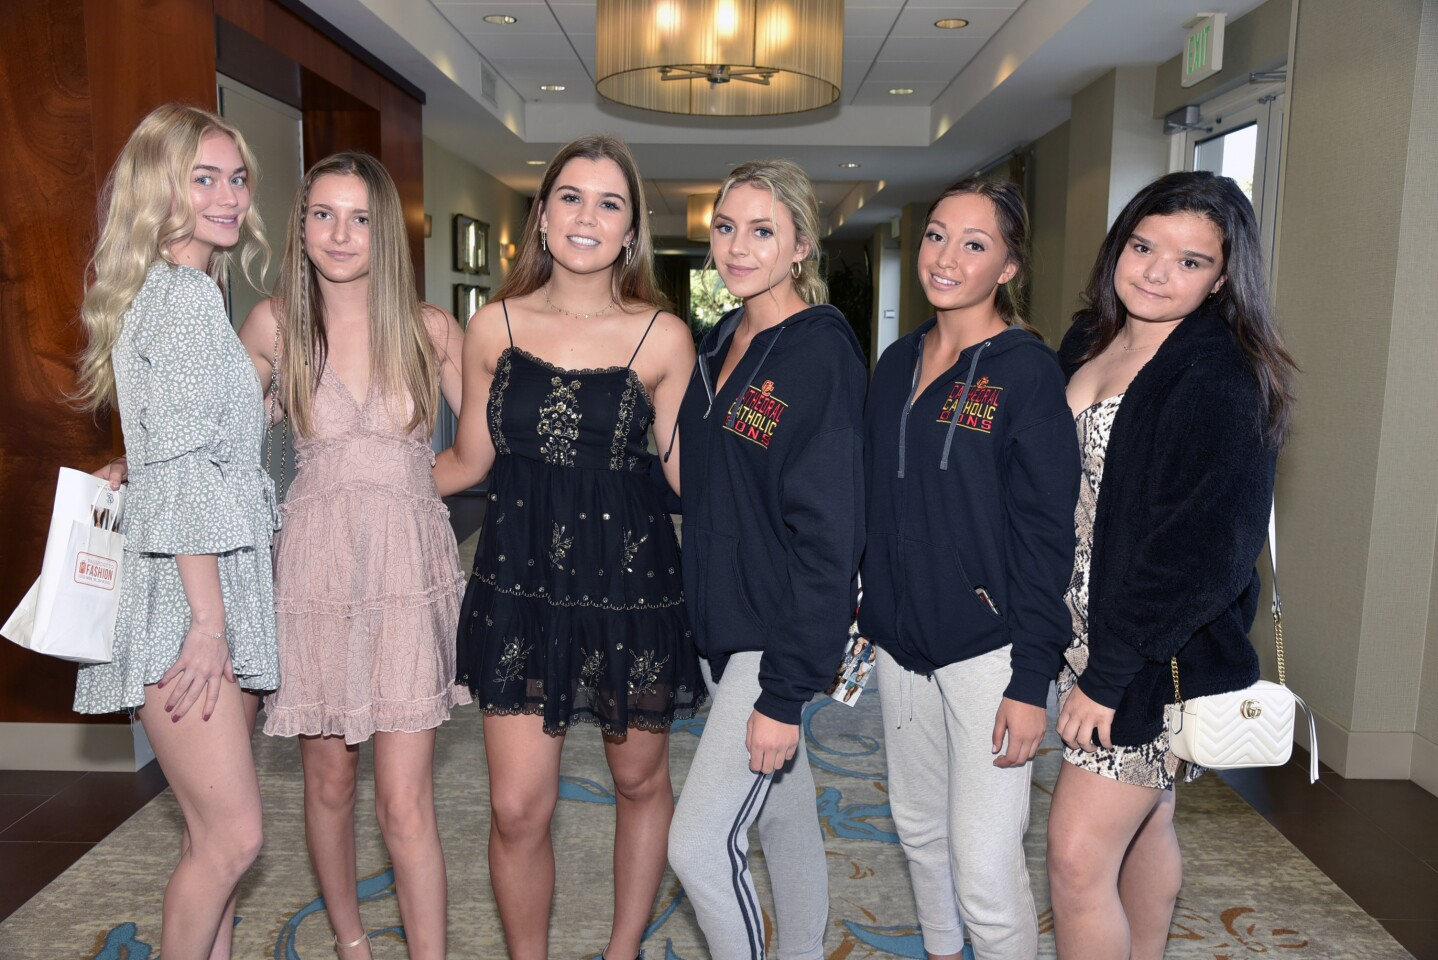 Ava Westfall, Grace Tecca, Emily Abts, Georgia Kimmel, Isabelle Mossy, Mirabella Nichols